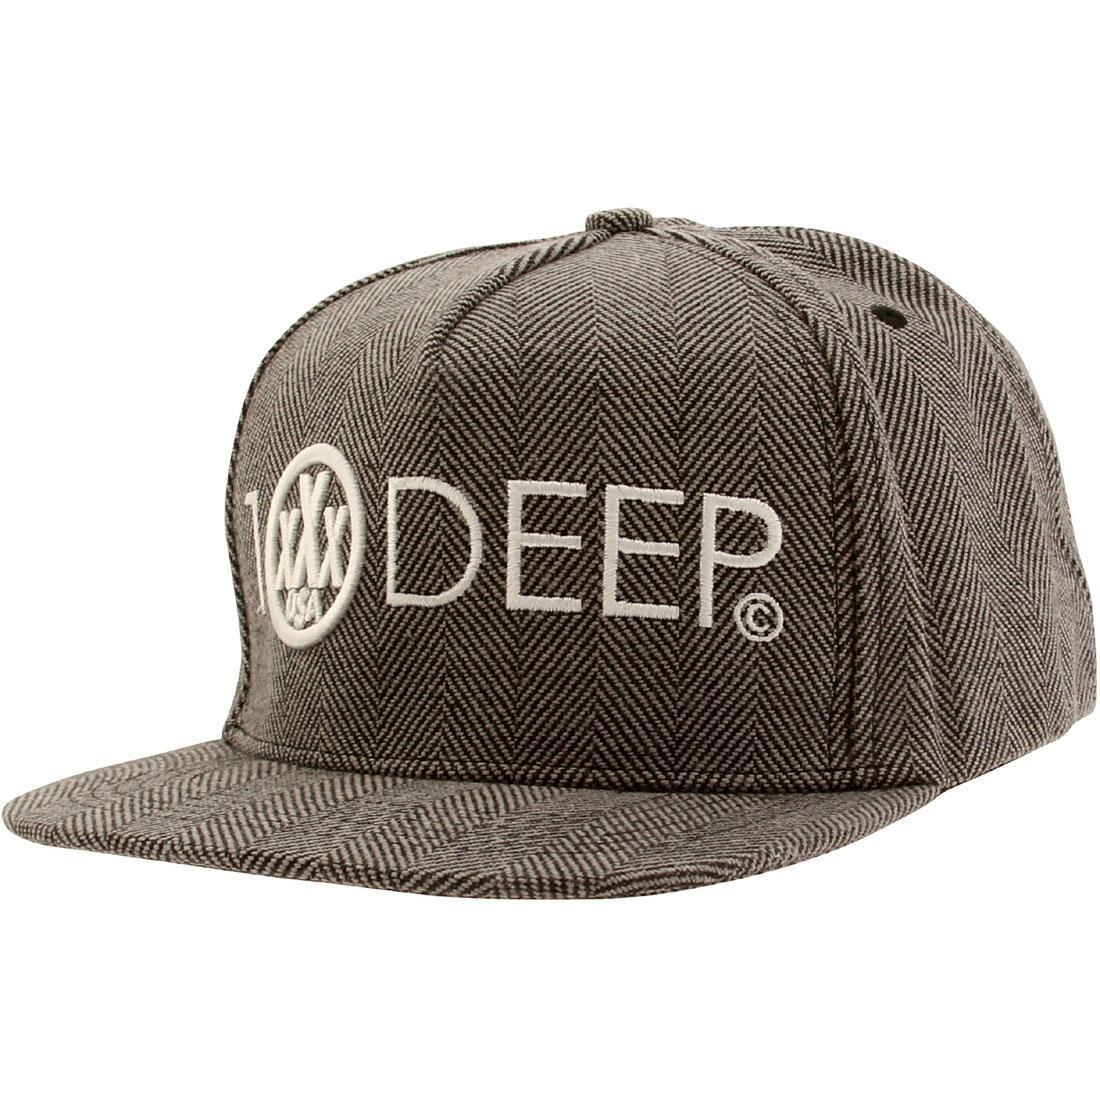 10 Deep Integral Snapback (gray)